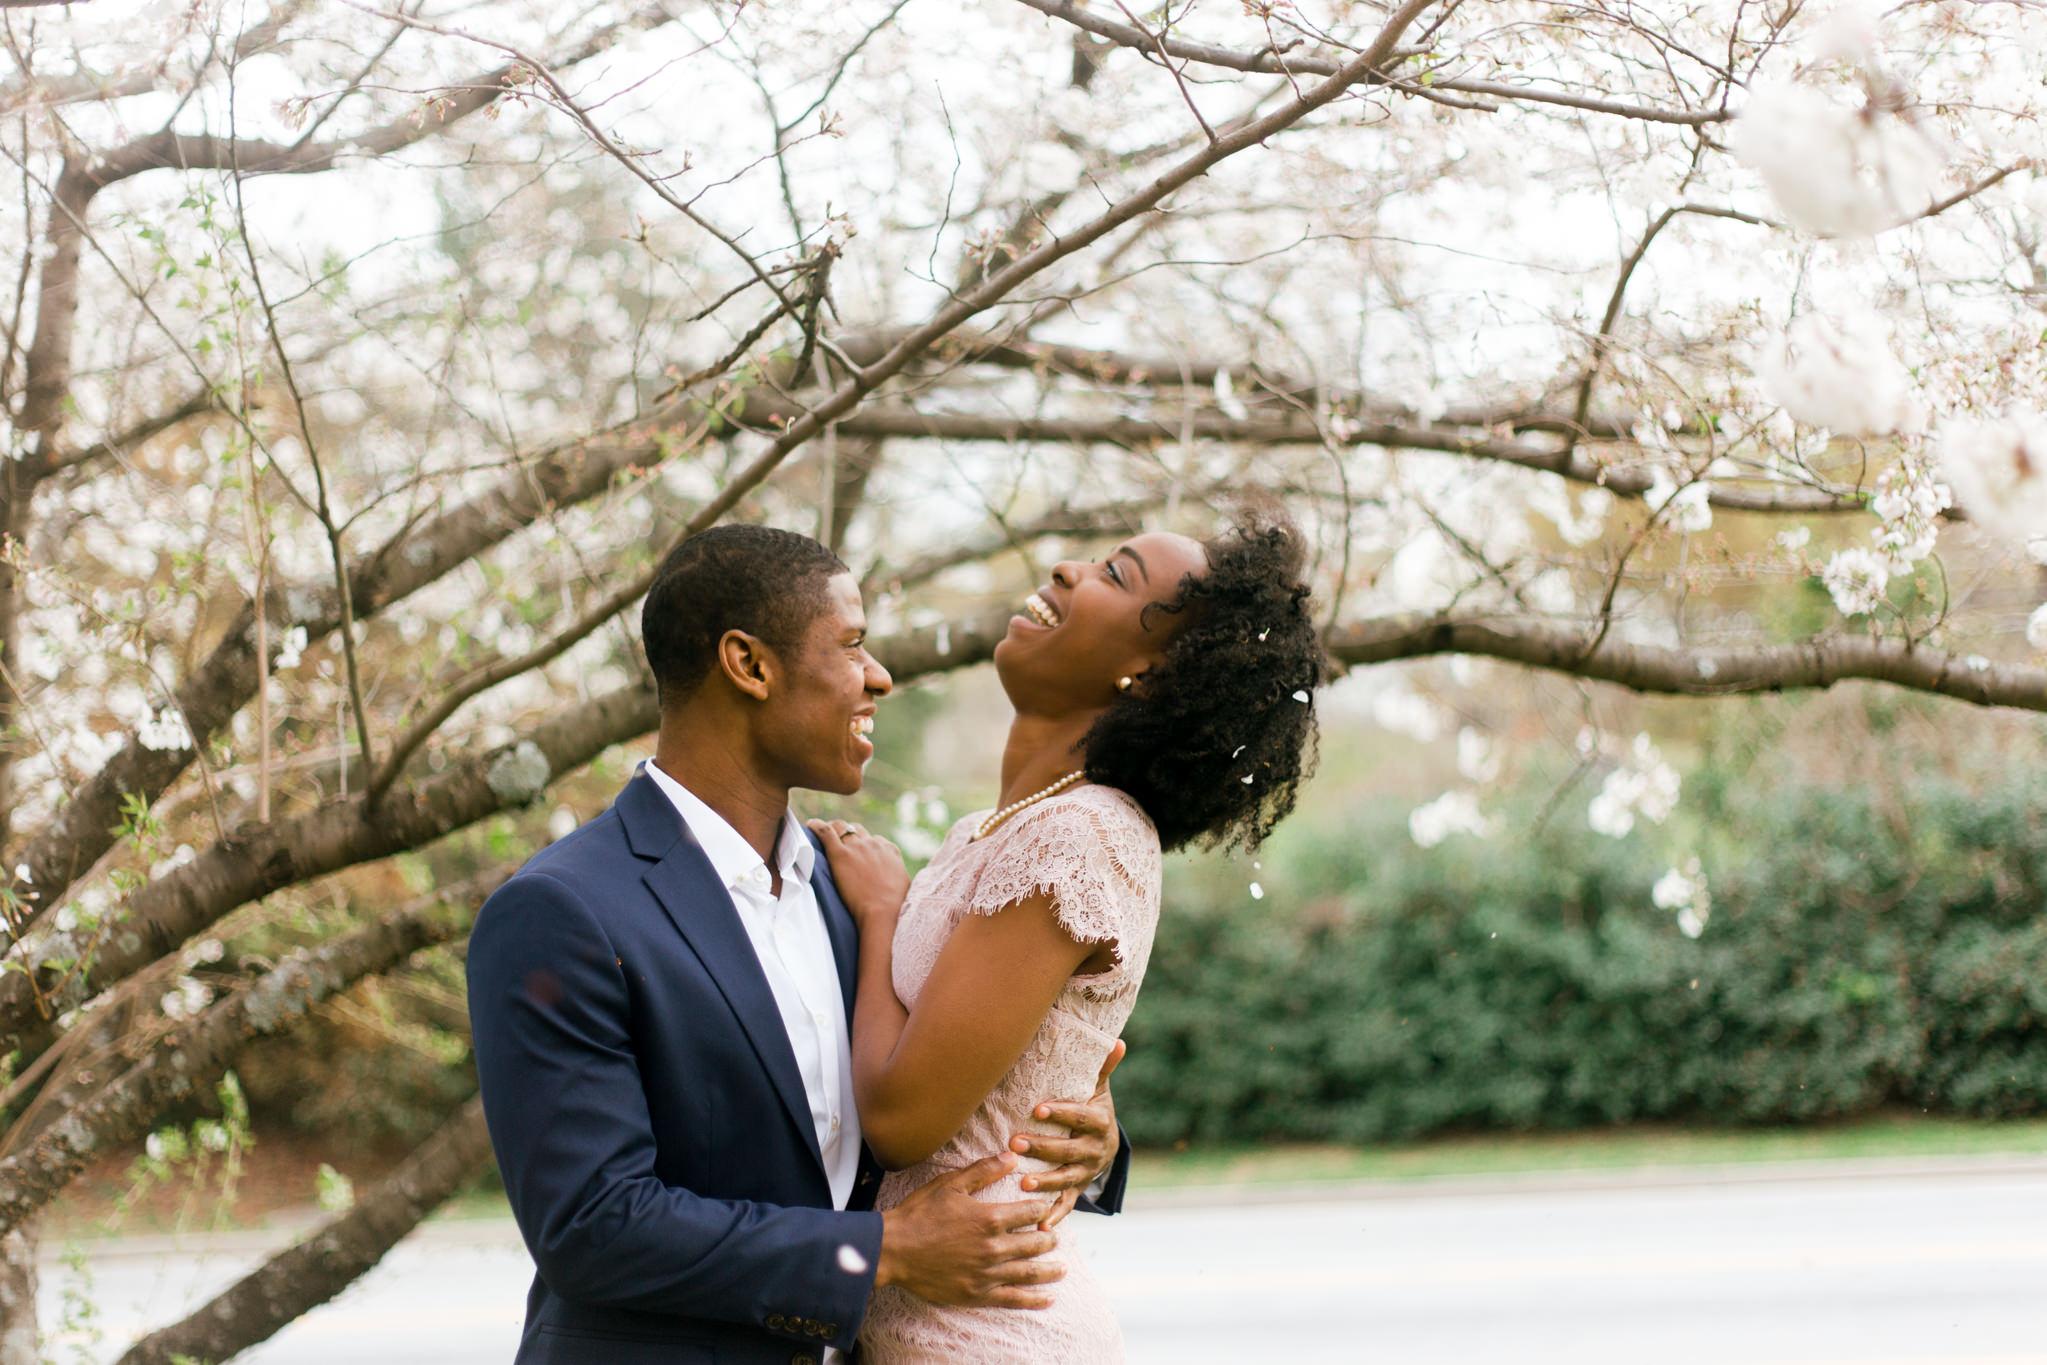 Grant-Park-Atlanta-Engagement-Pictures-Kiyah-C-Photography-17.jpg